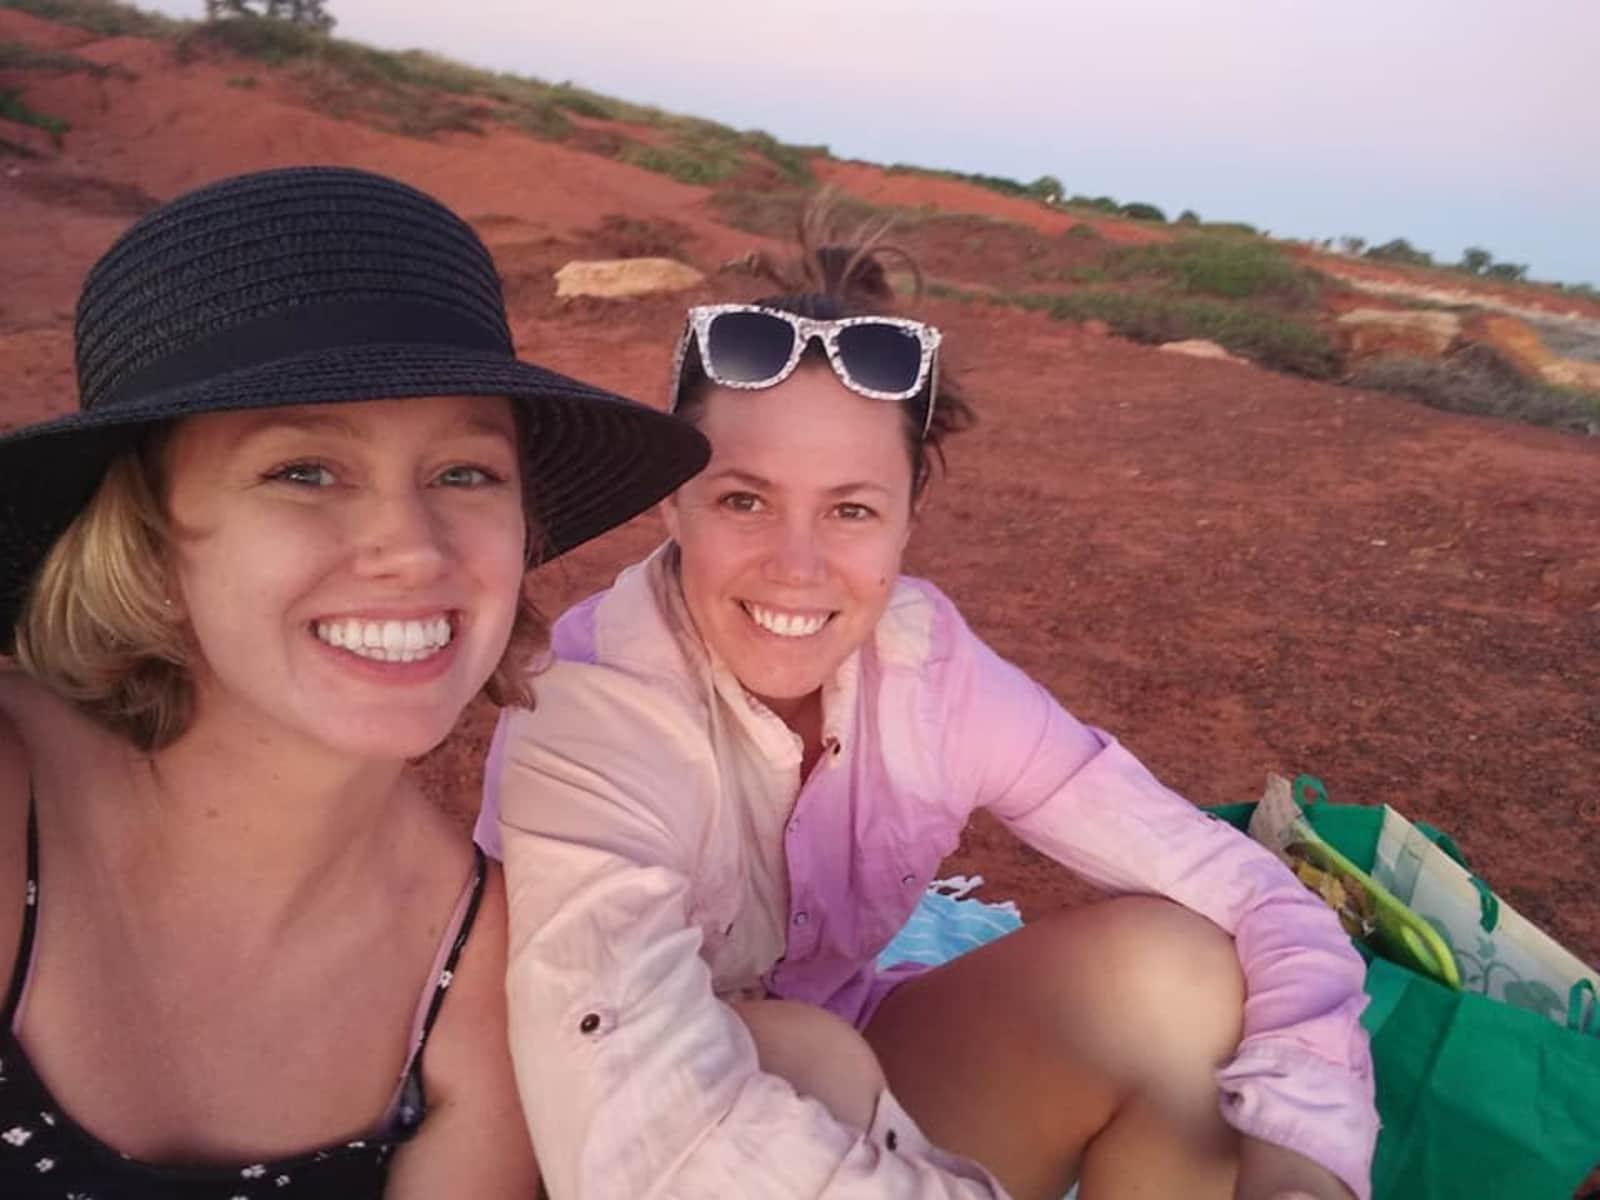 Emily & Kaitlin from Broome, Western Australia, Australia